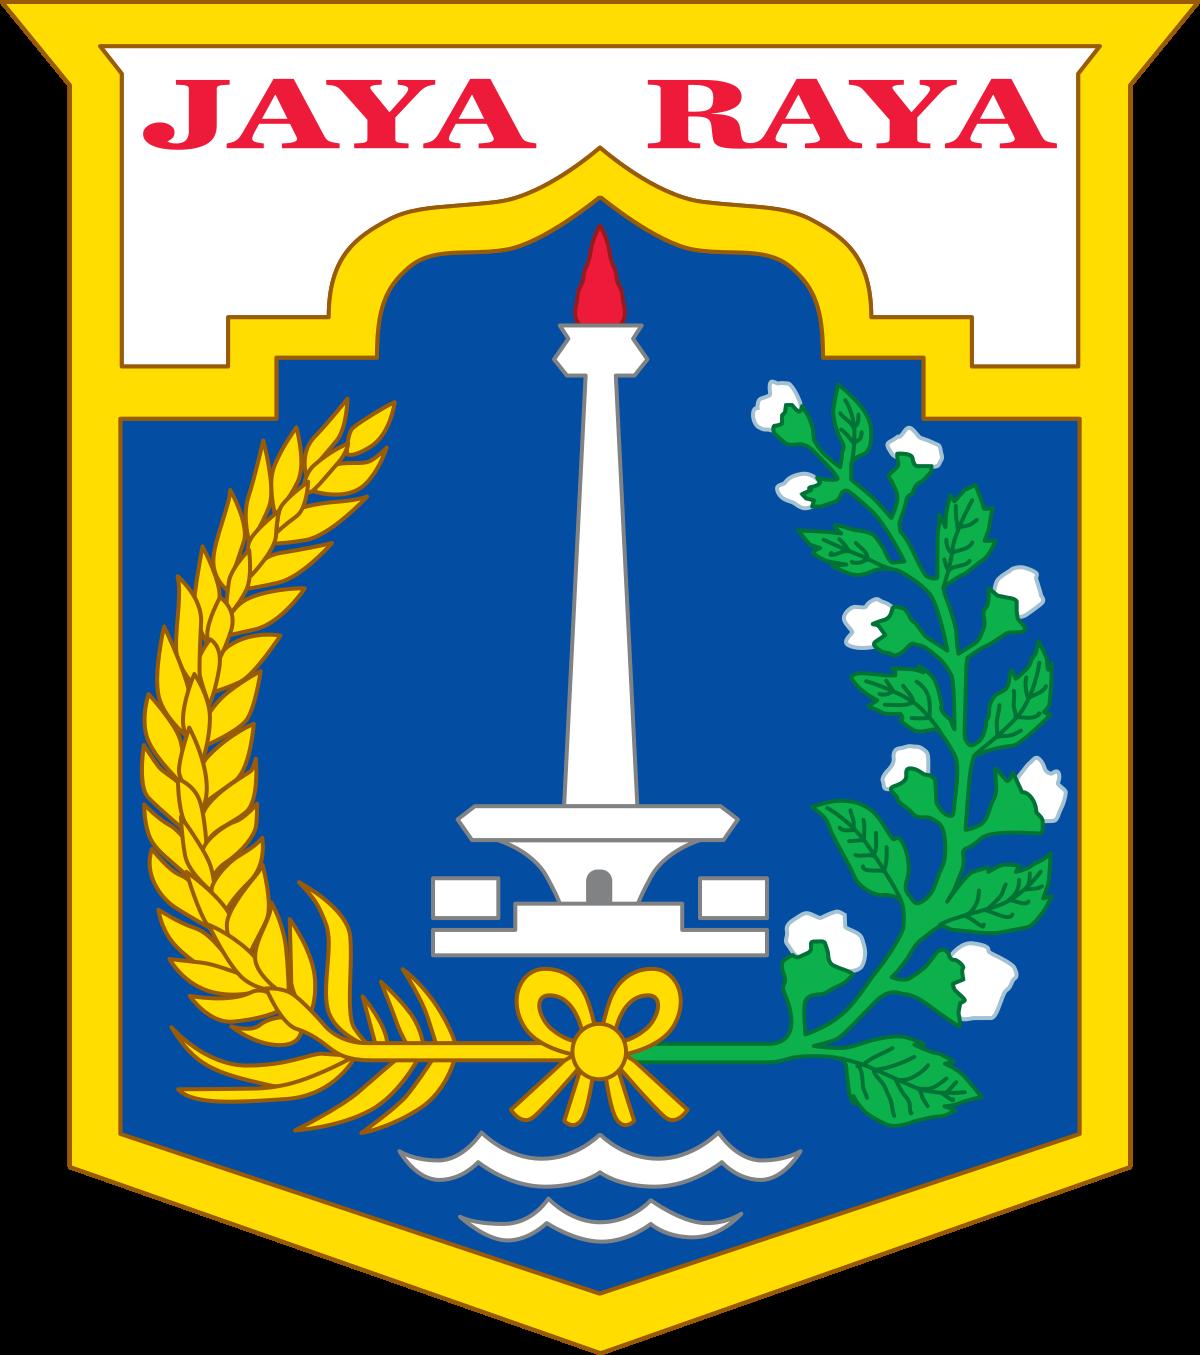 File:Coat of arms of Jakarta.svg.